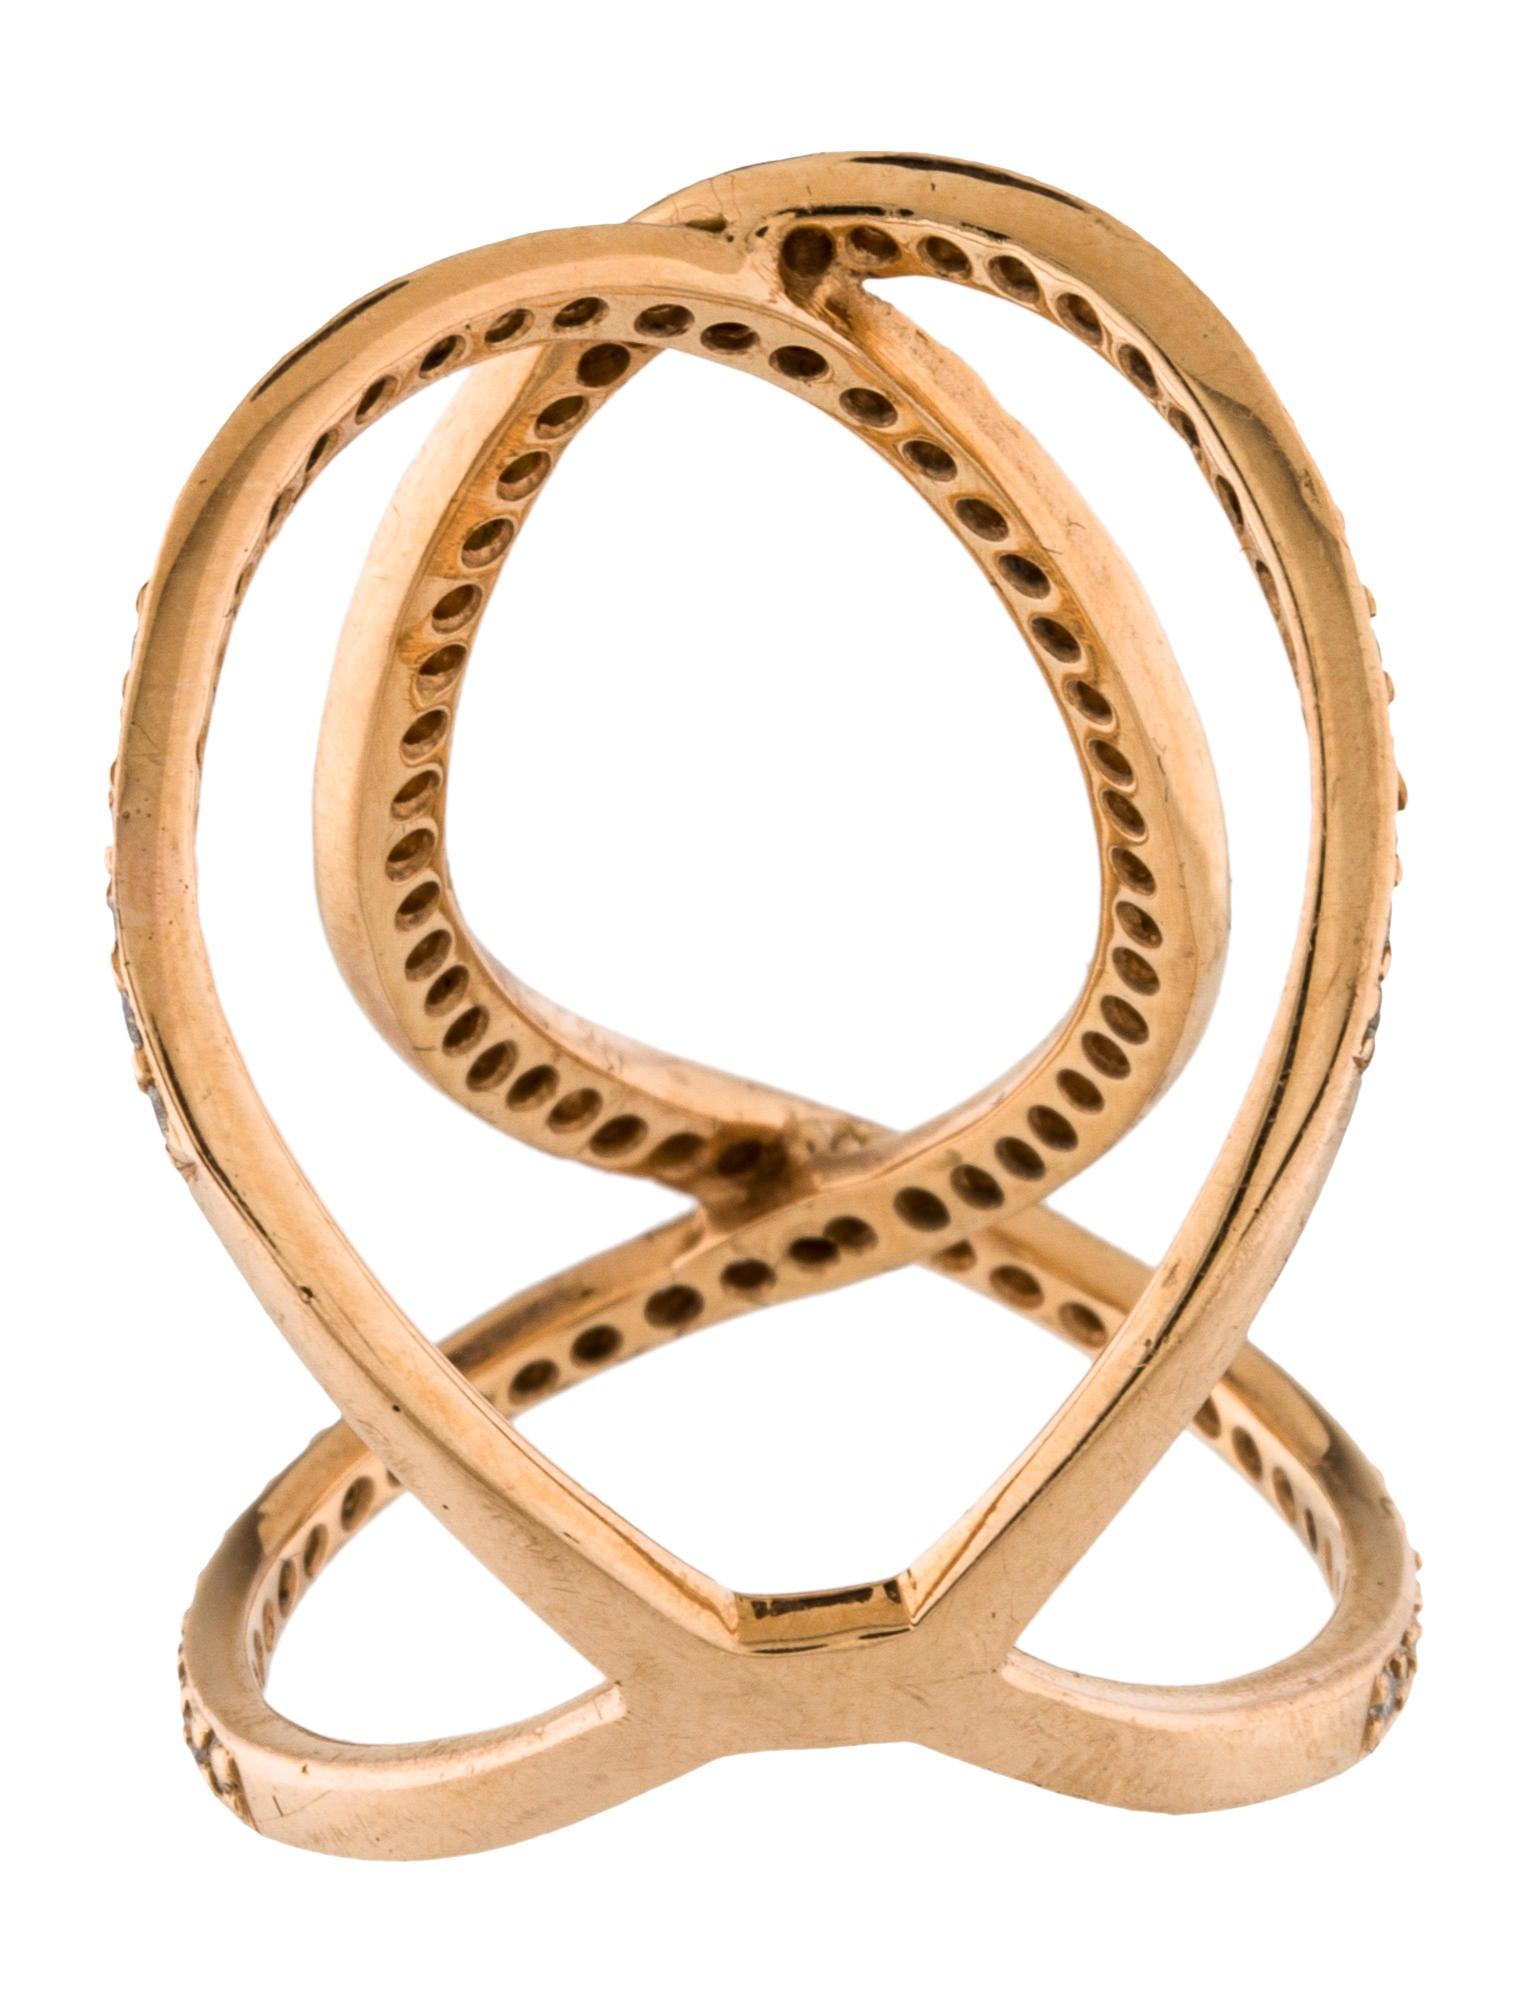 Anita ko diamond infinity ring rings ani20102 the for Infinity ring jewelry store